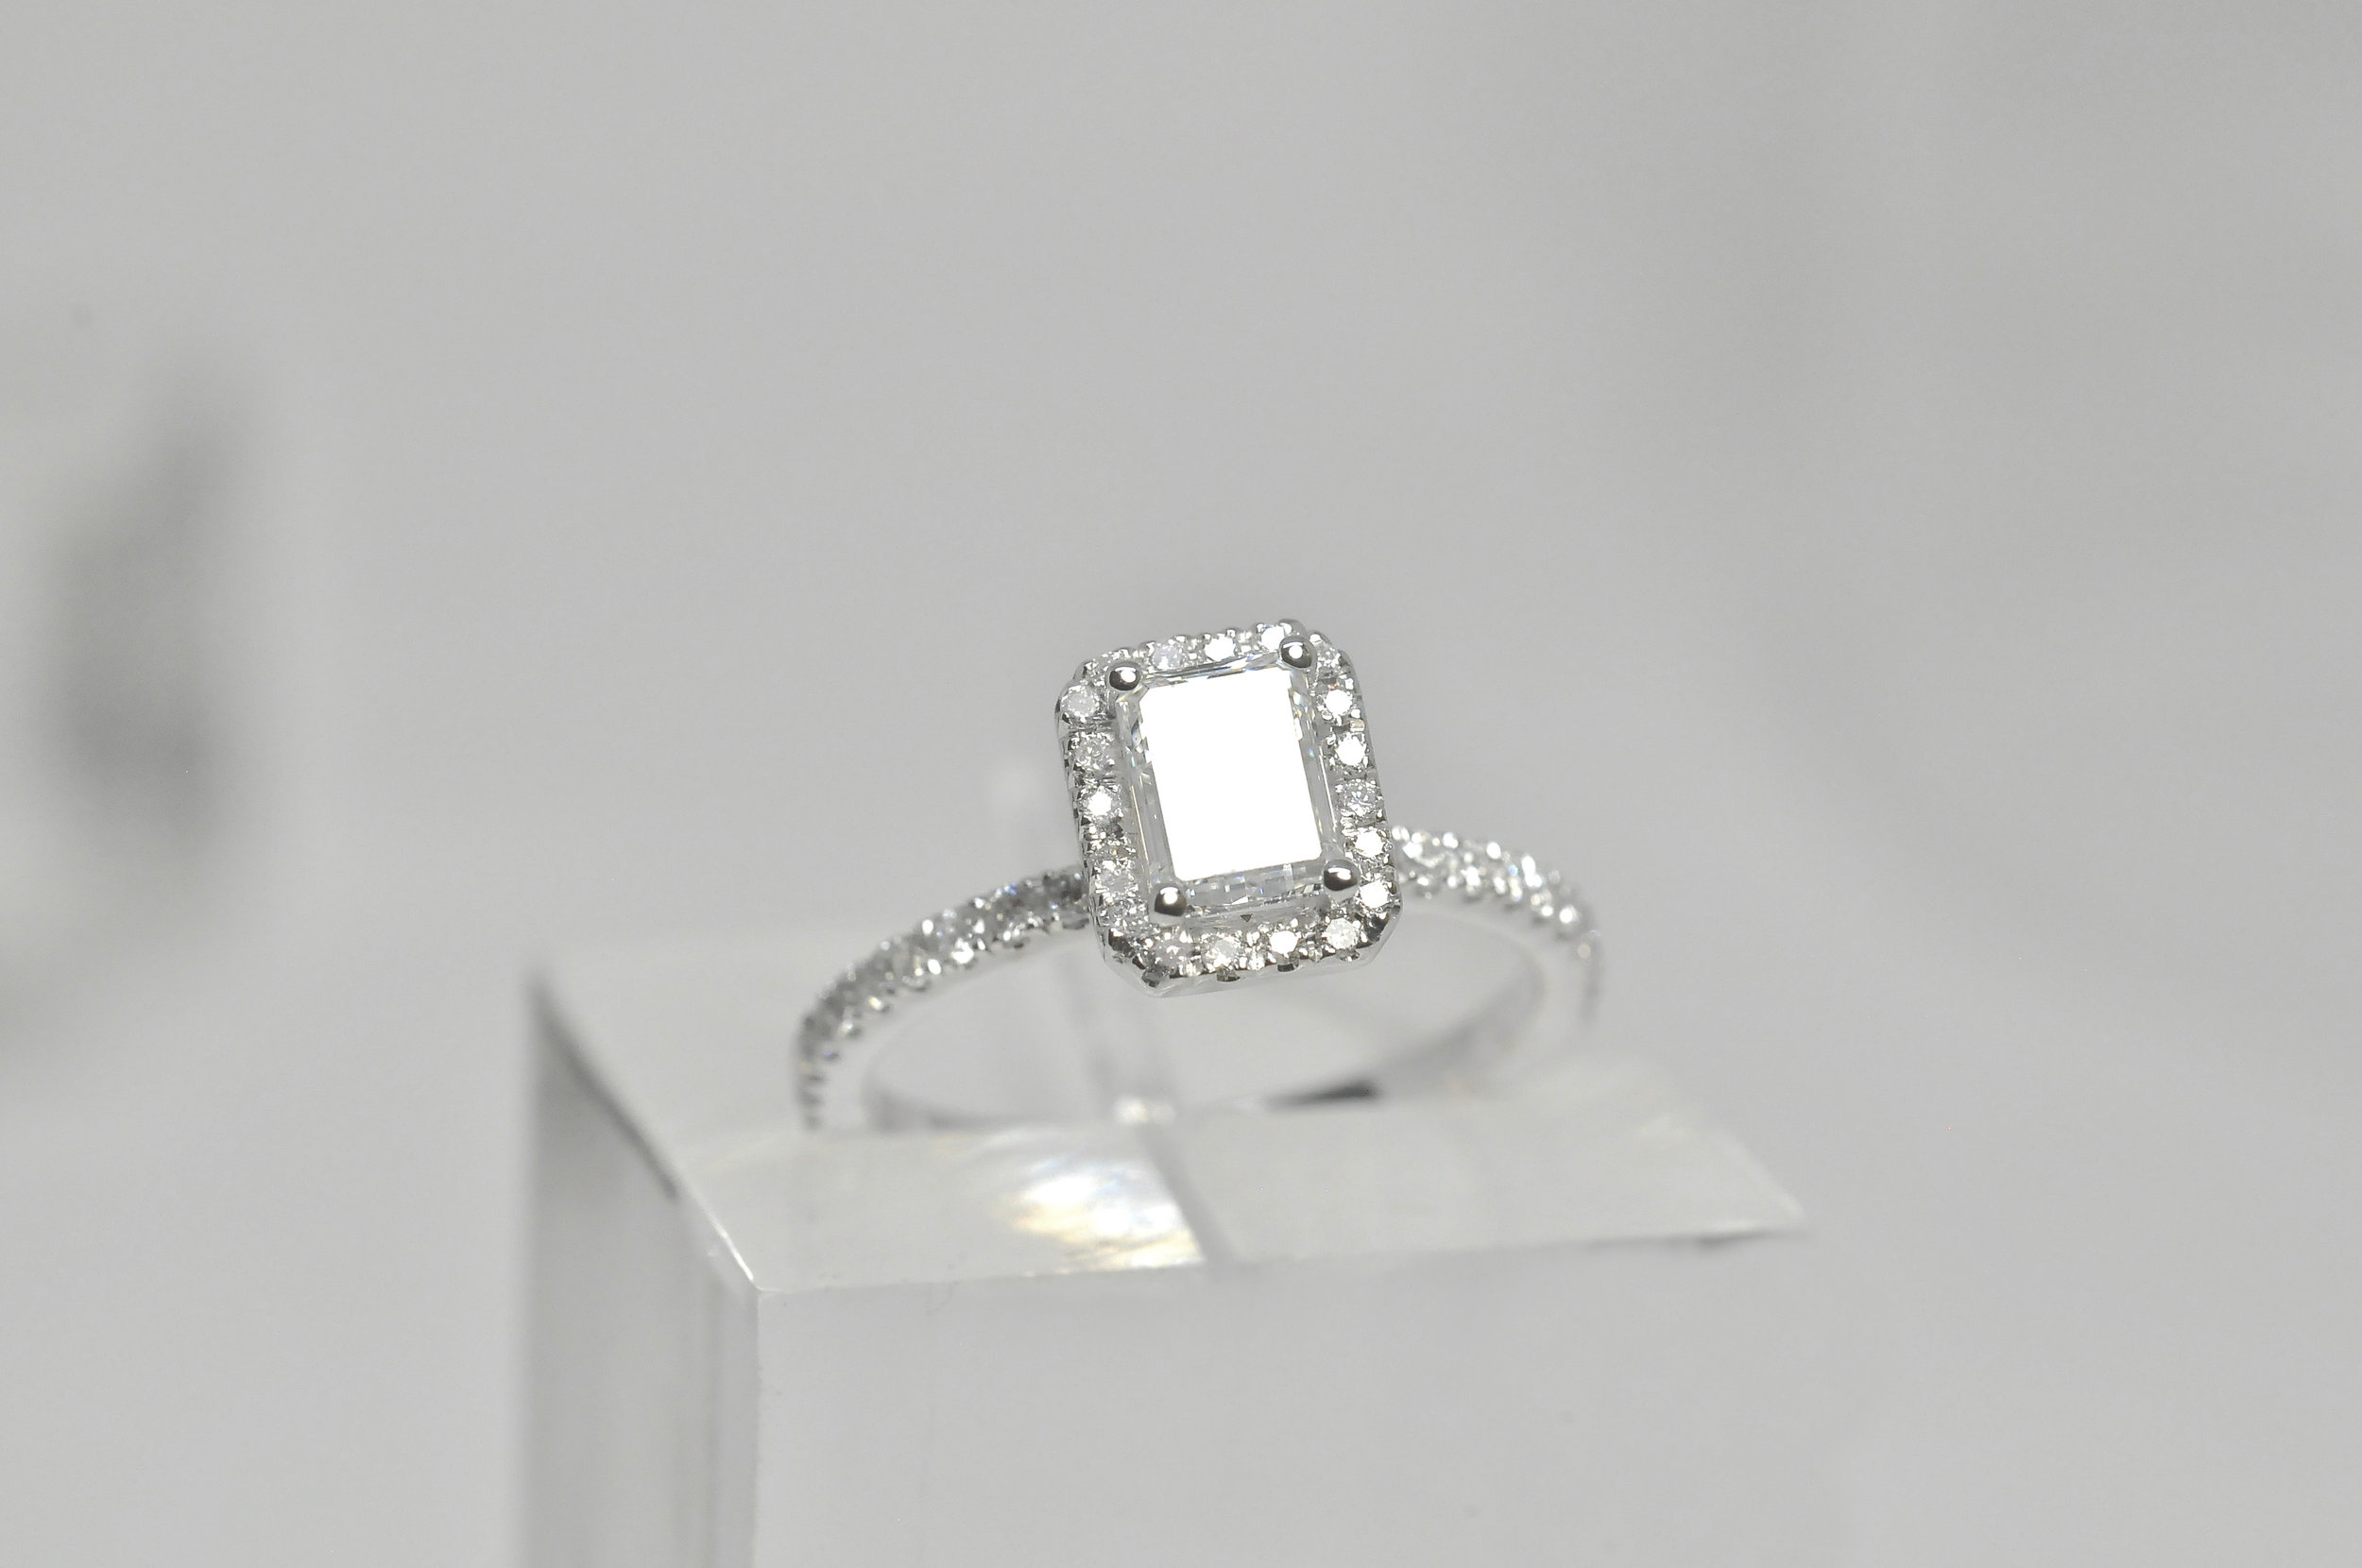 Emerald Cut Diamond Toronto.jpg